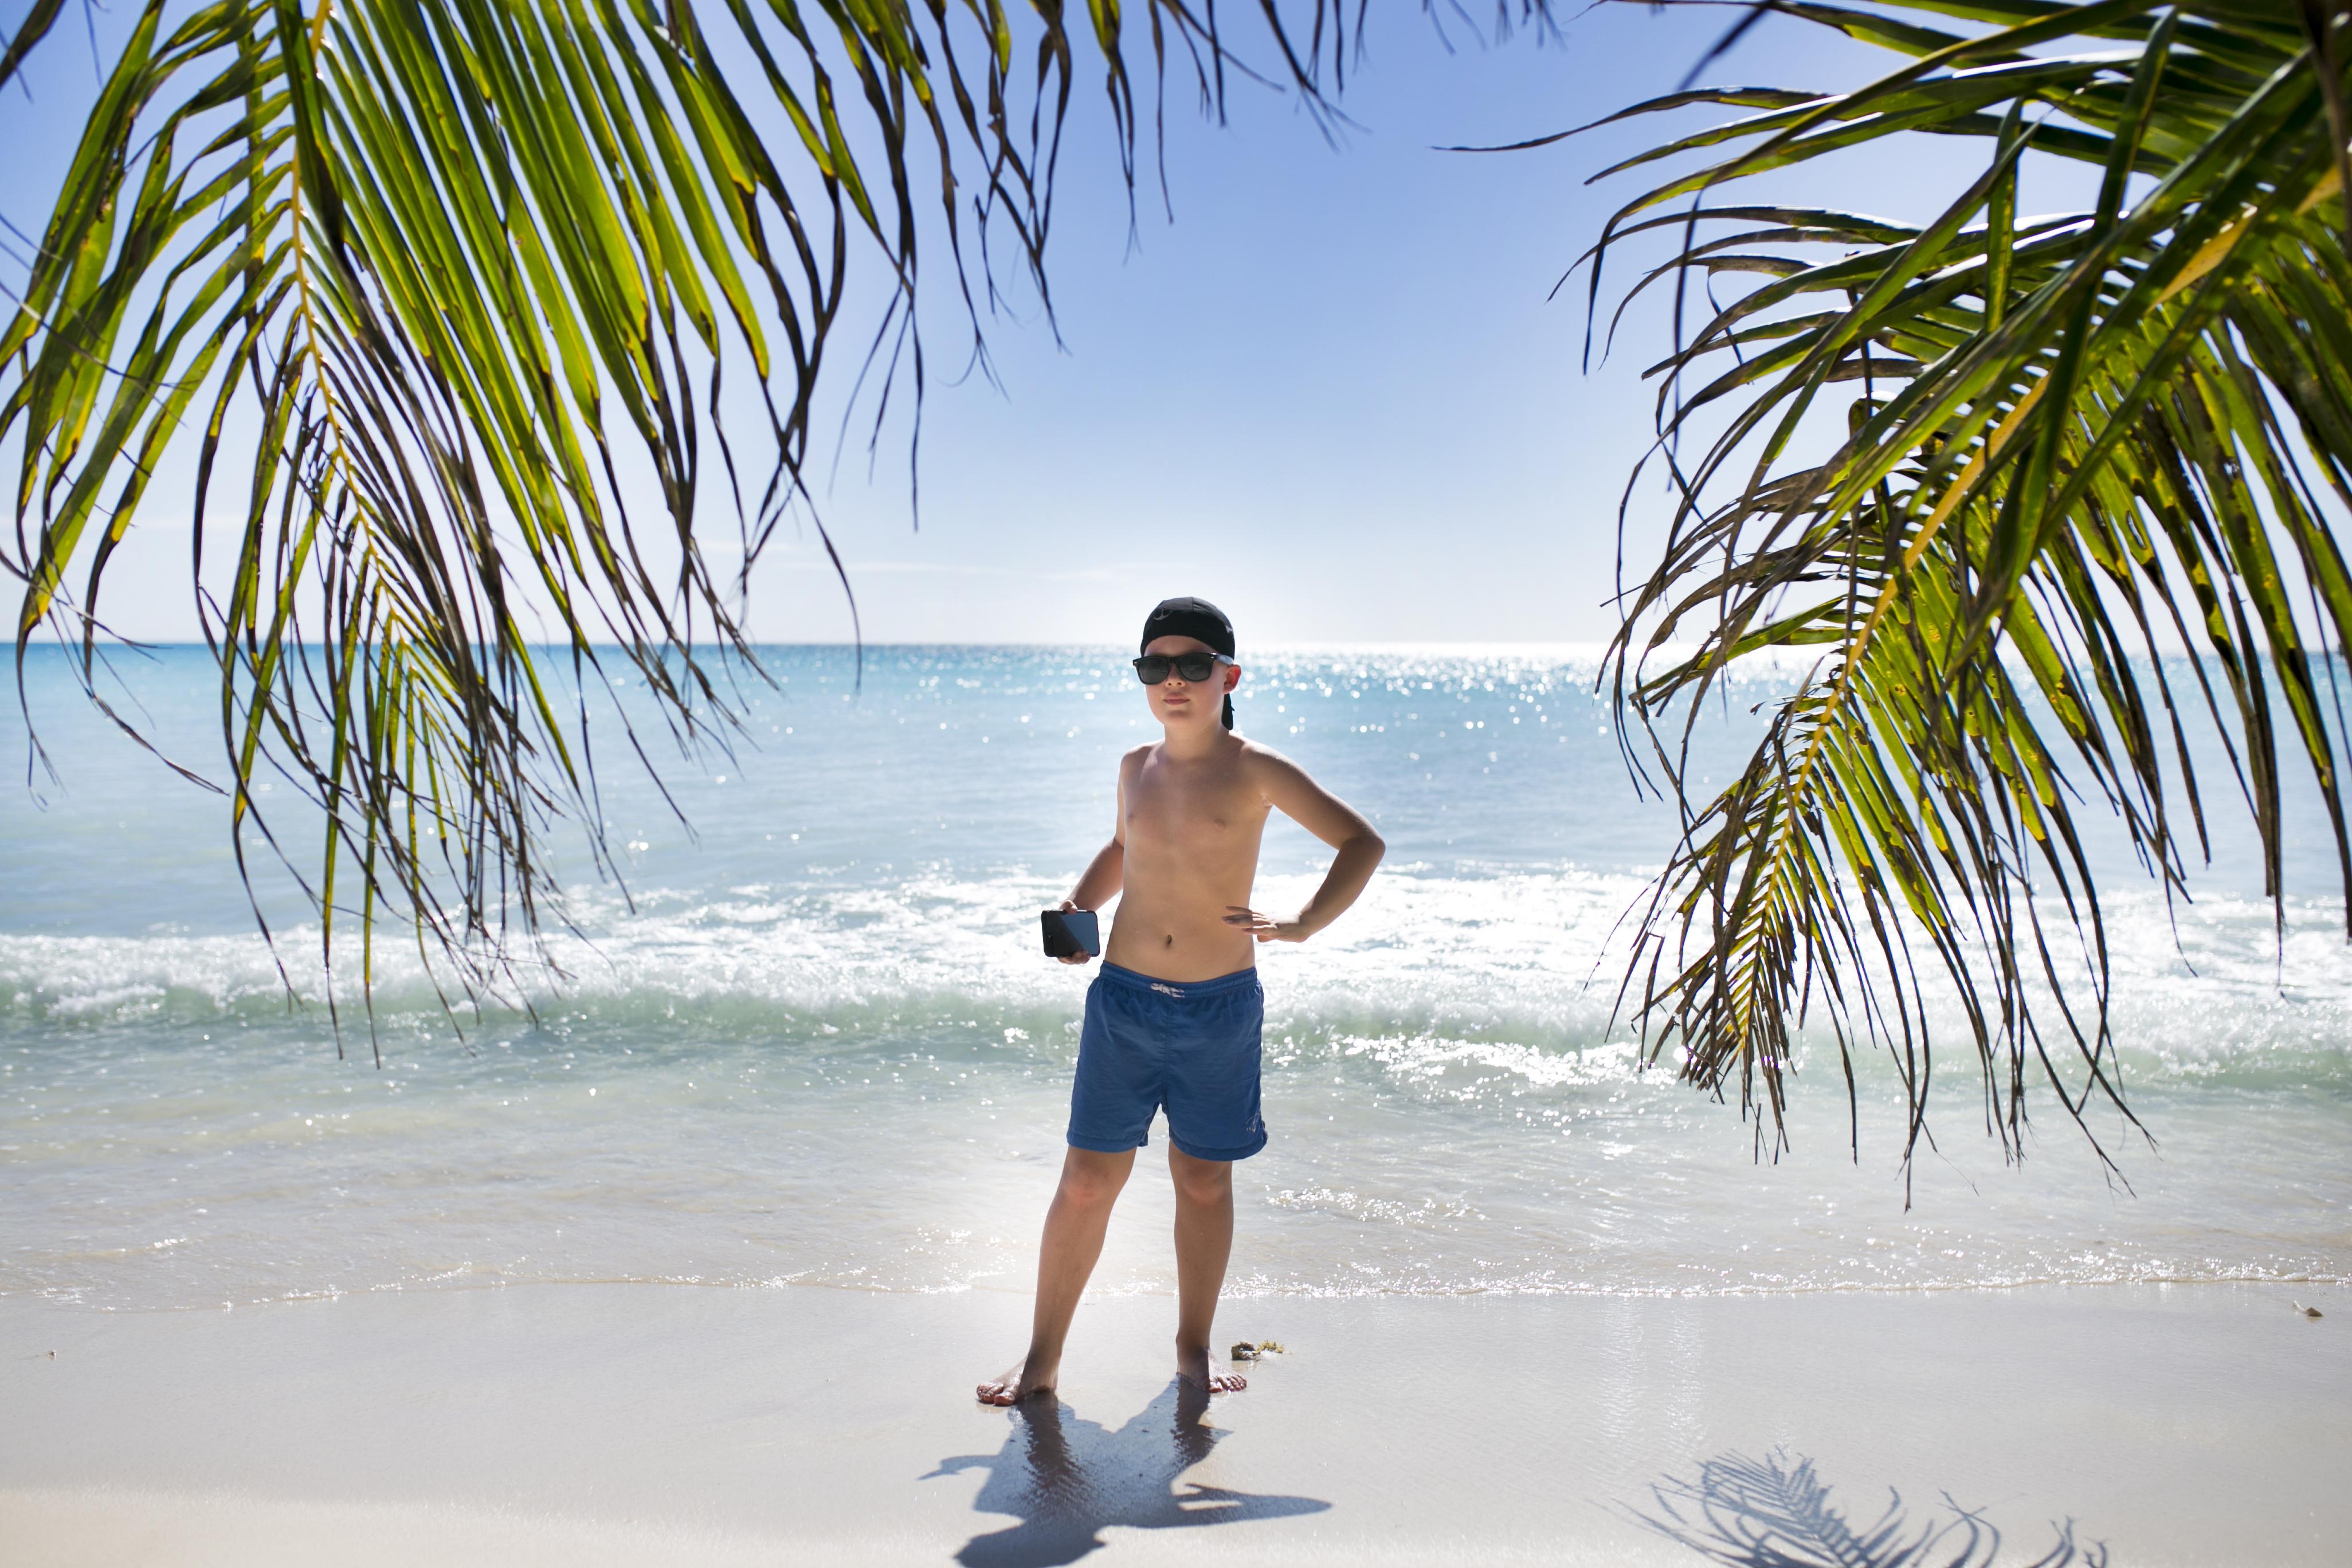 Pisciny Natural, saona island wycieczka, karaiby